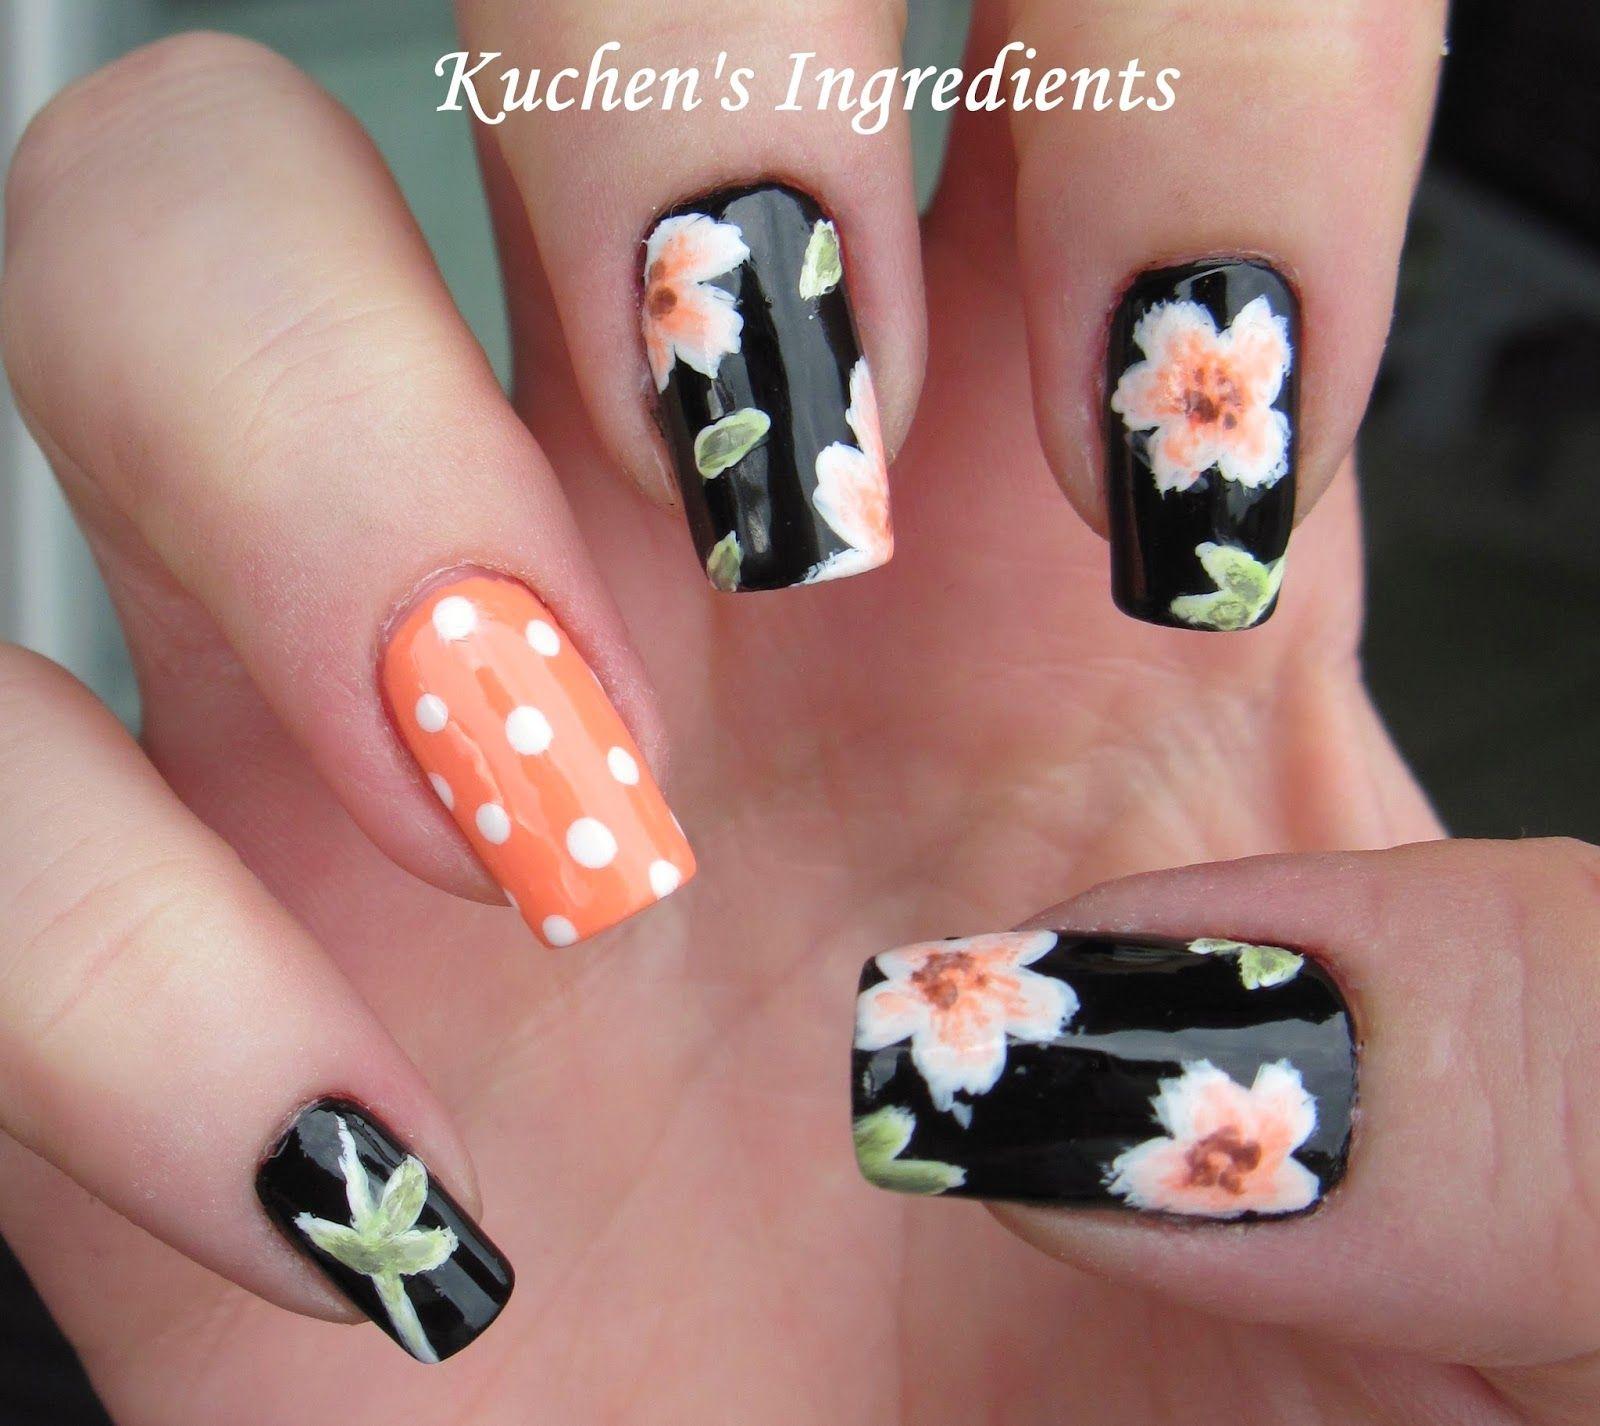 Kuchens ingredients: flowers nail design   Nails 2   Pinterest ...